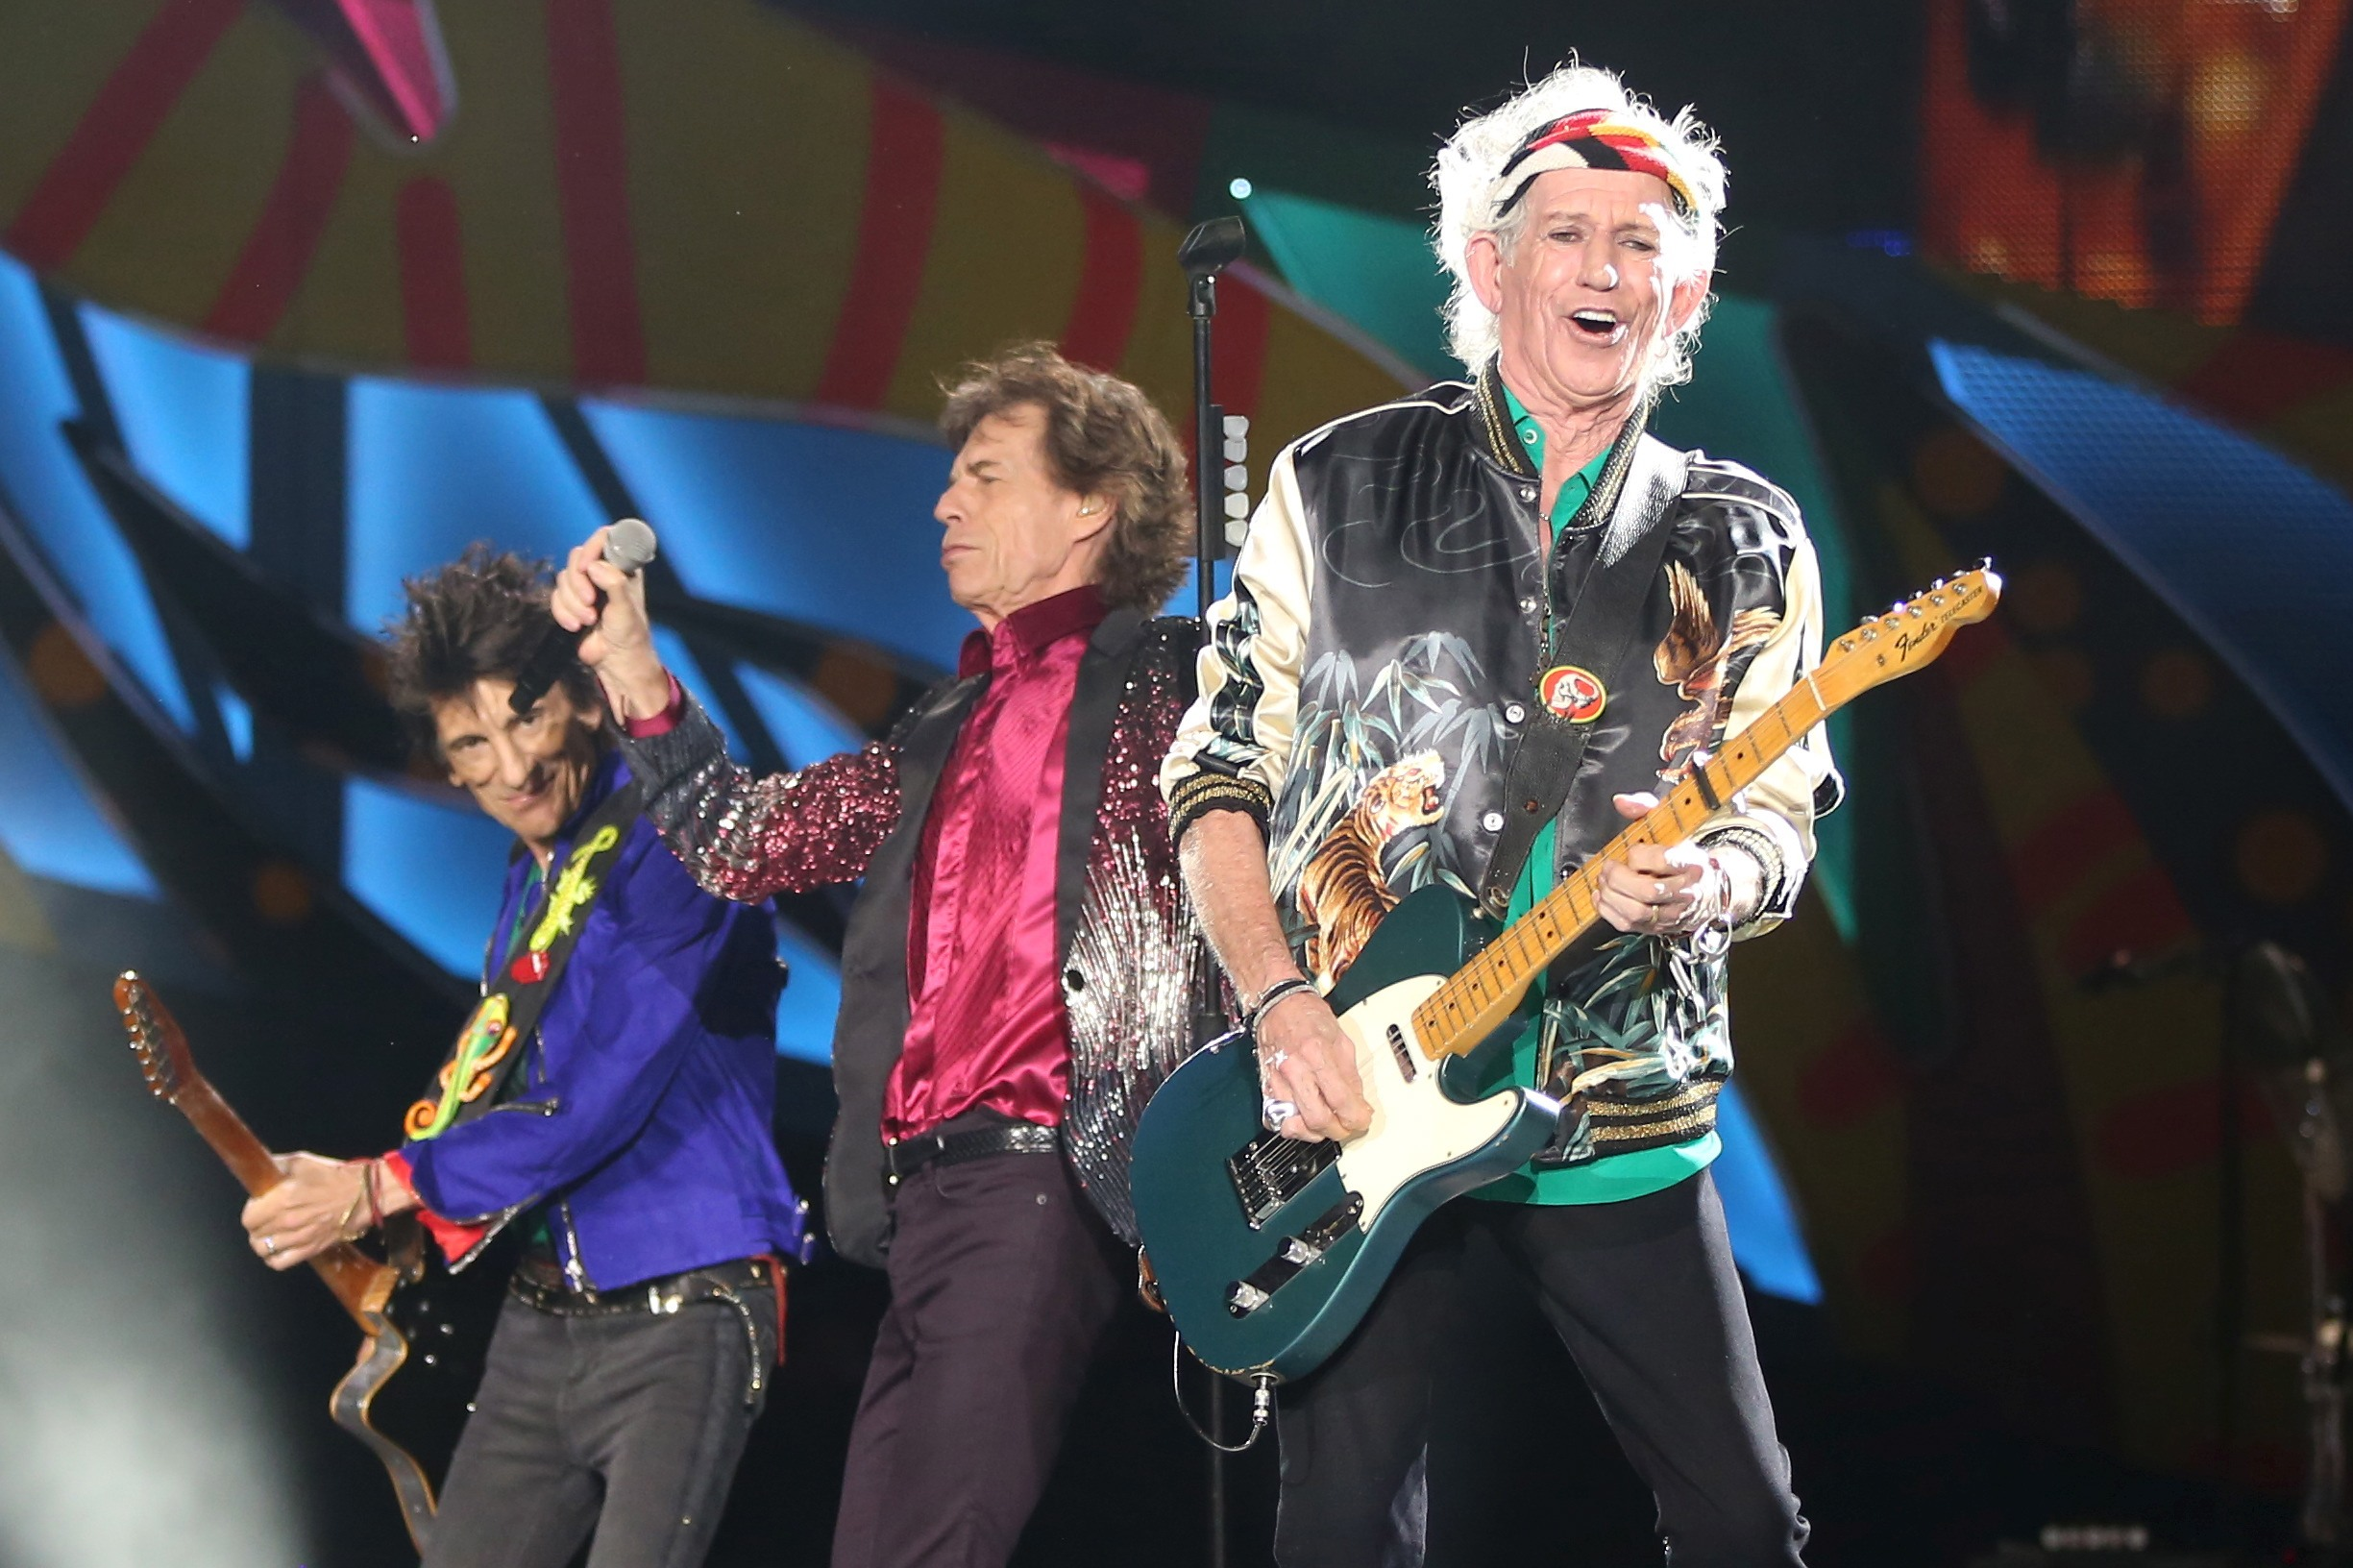 Rolling Stones Havana 2016 10 06T124423Z 1125741981 TM3ECA51B5901 RTRMADP 3 MUSIC ROLLINGSTONES